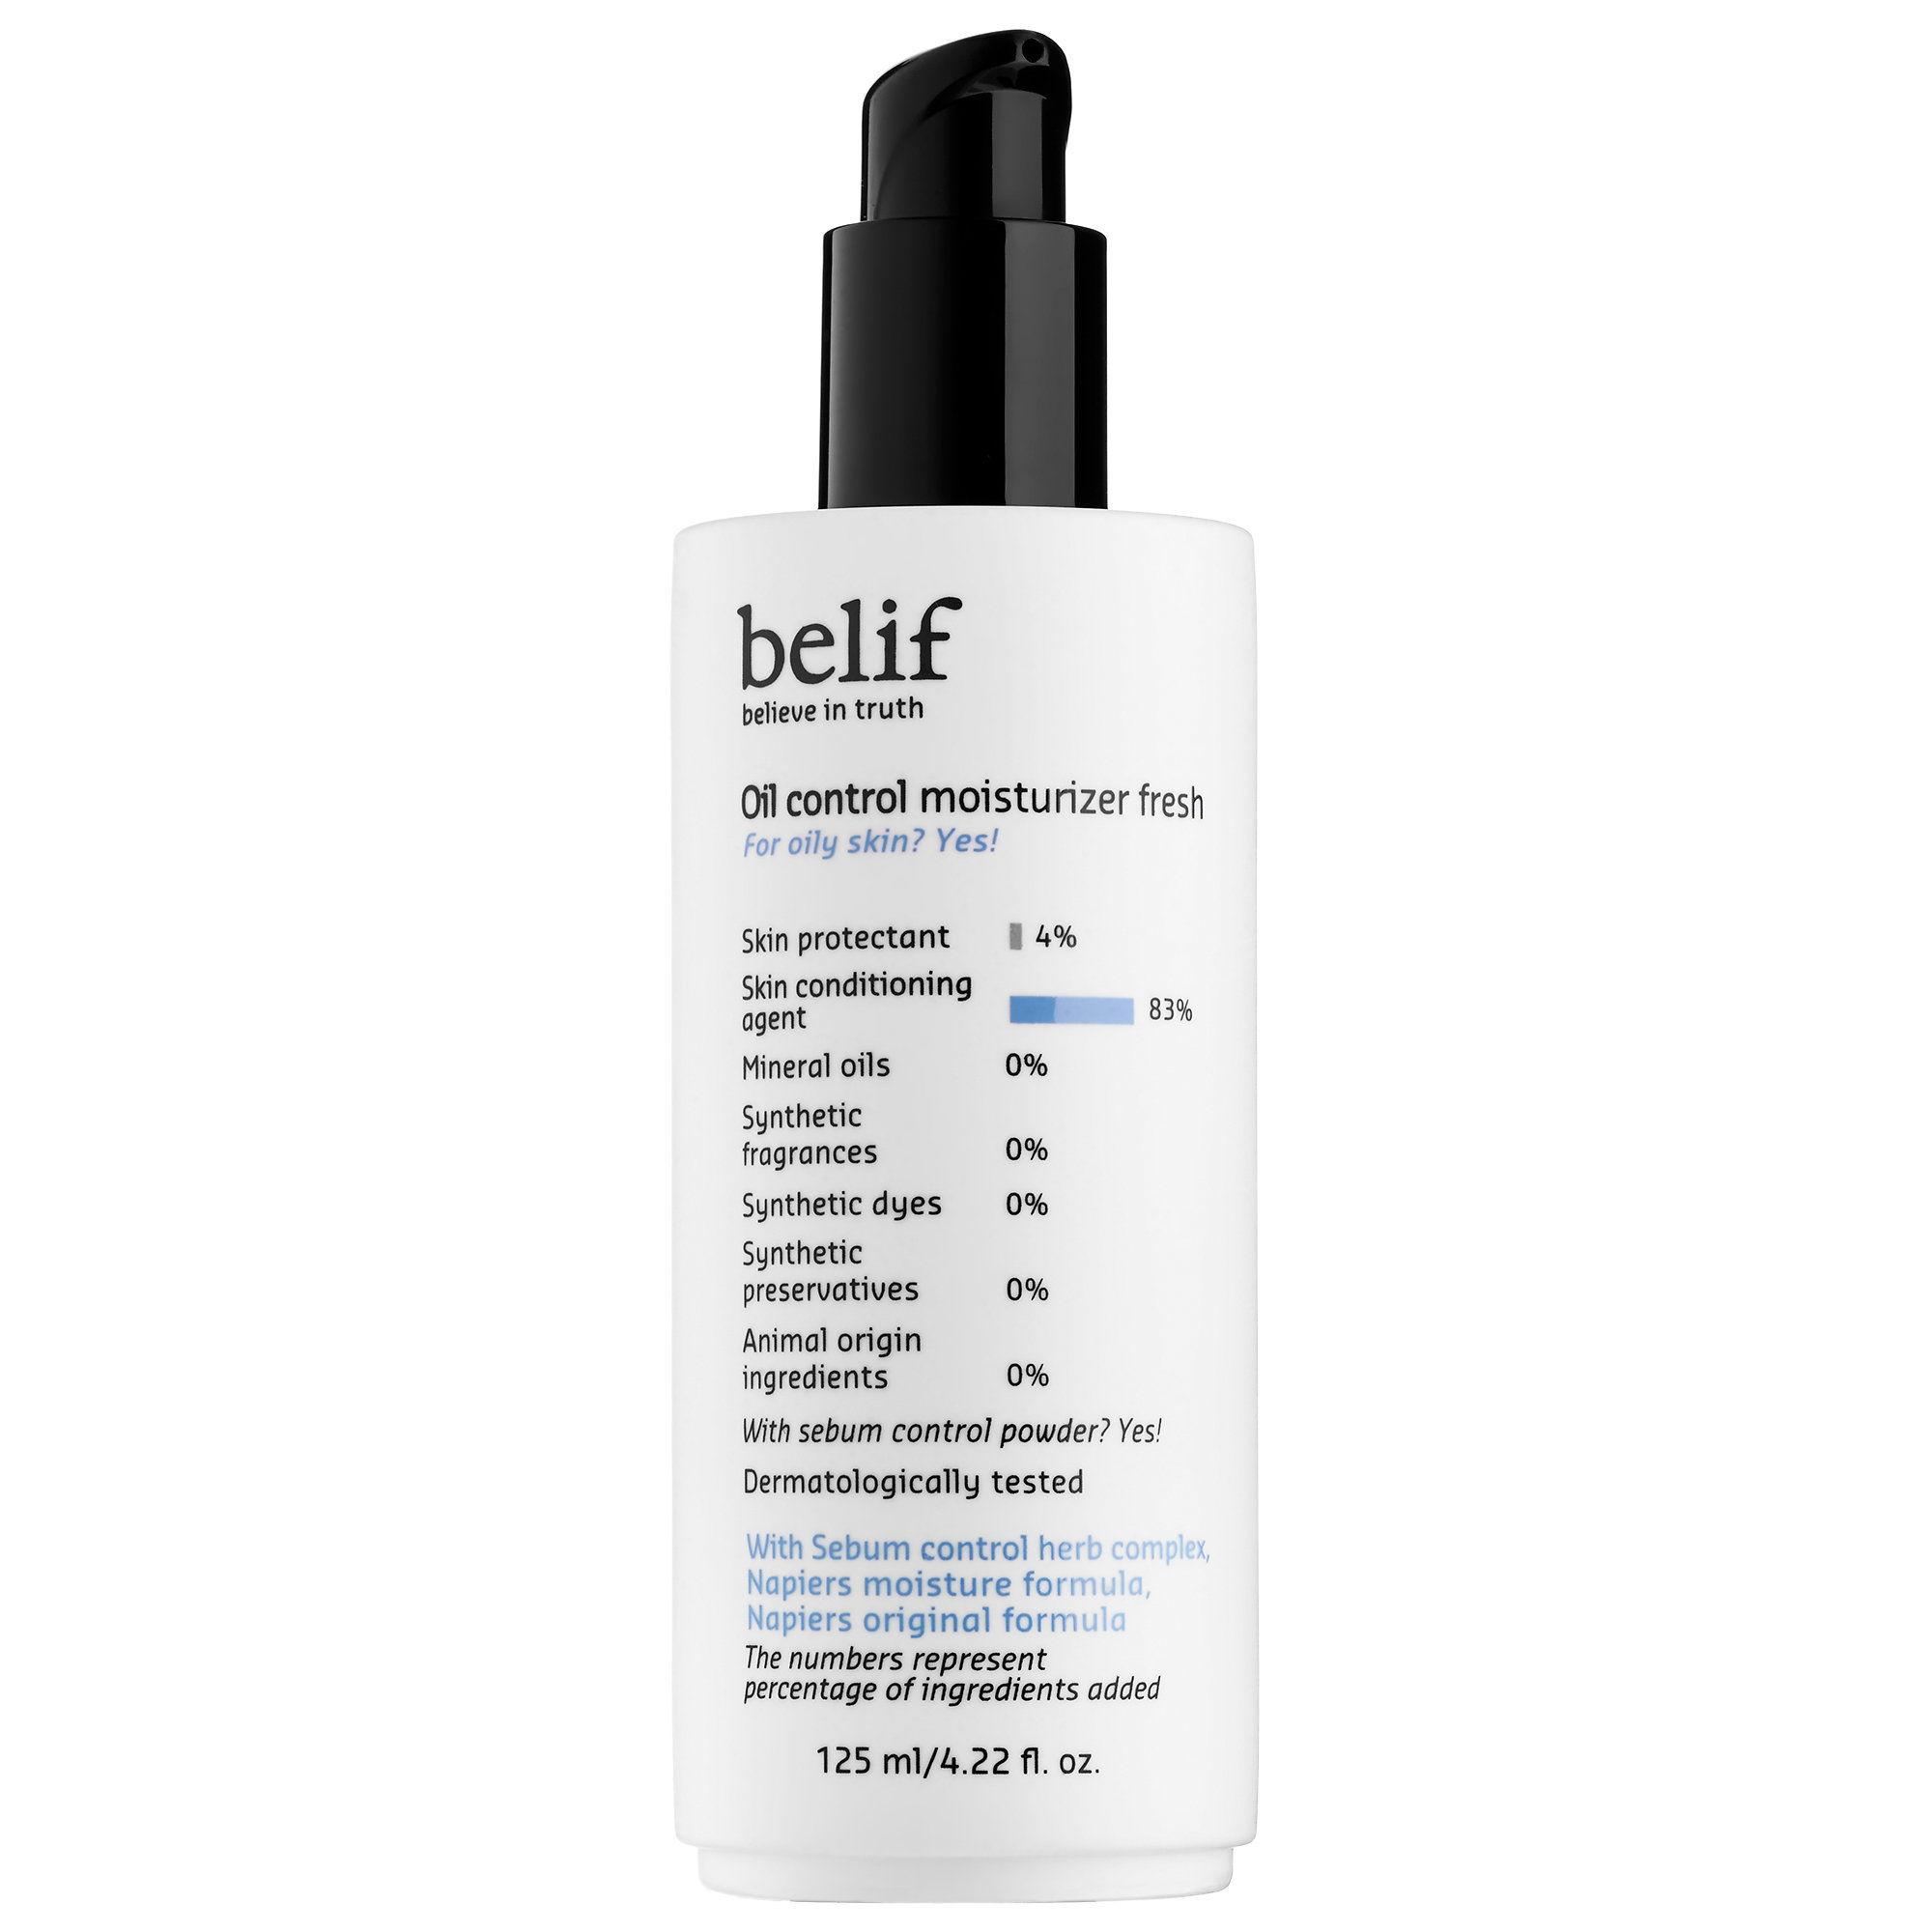 Belif oil control moisturiser